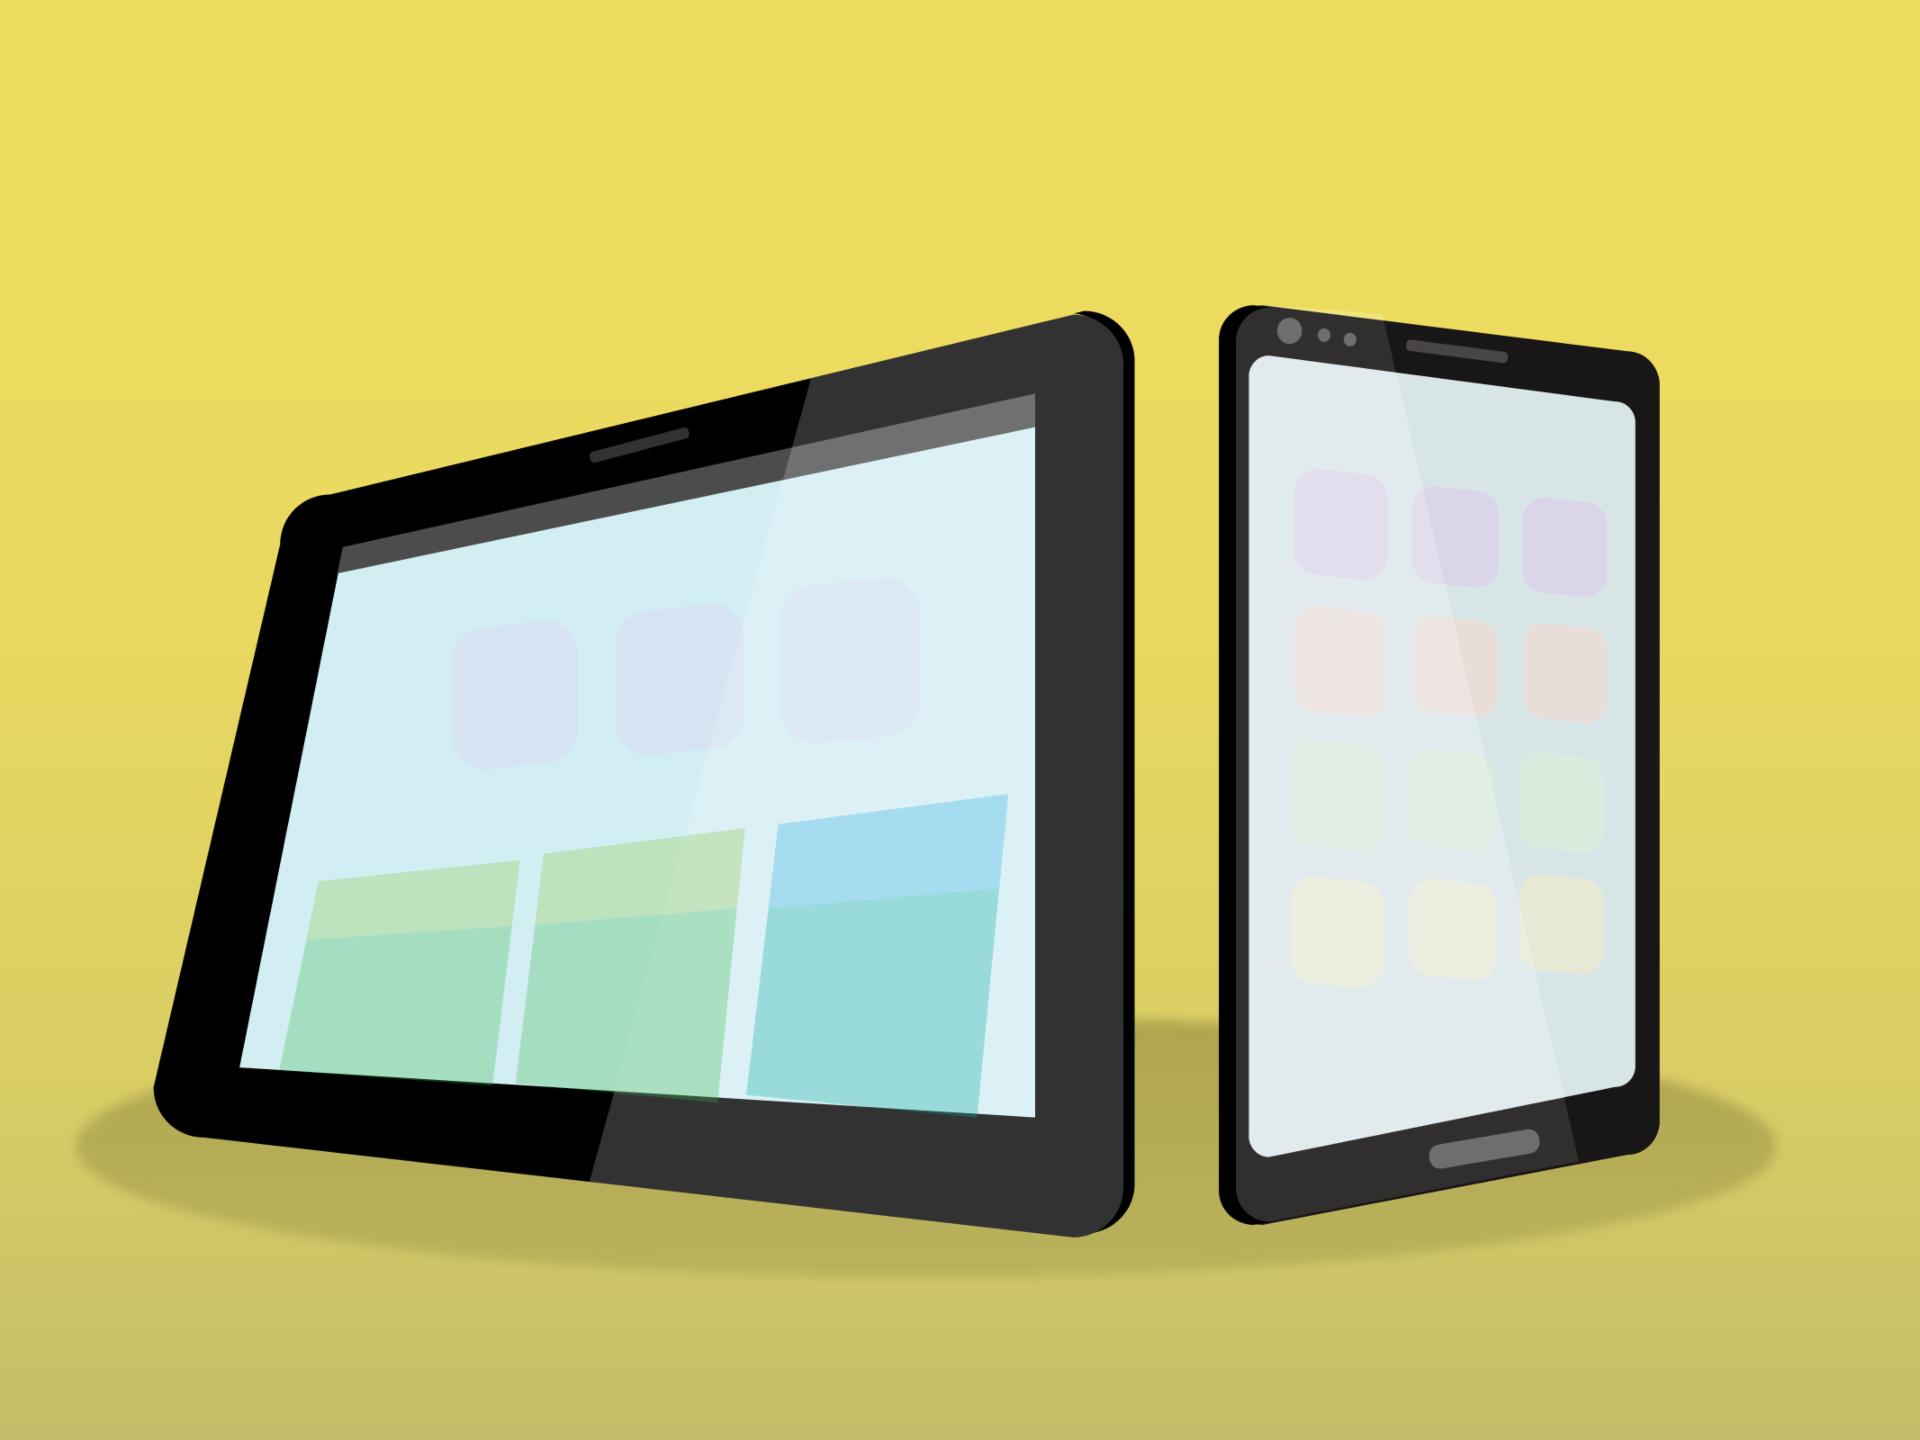 Tablet ou tablet e smartphone ou telefone inteligente.